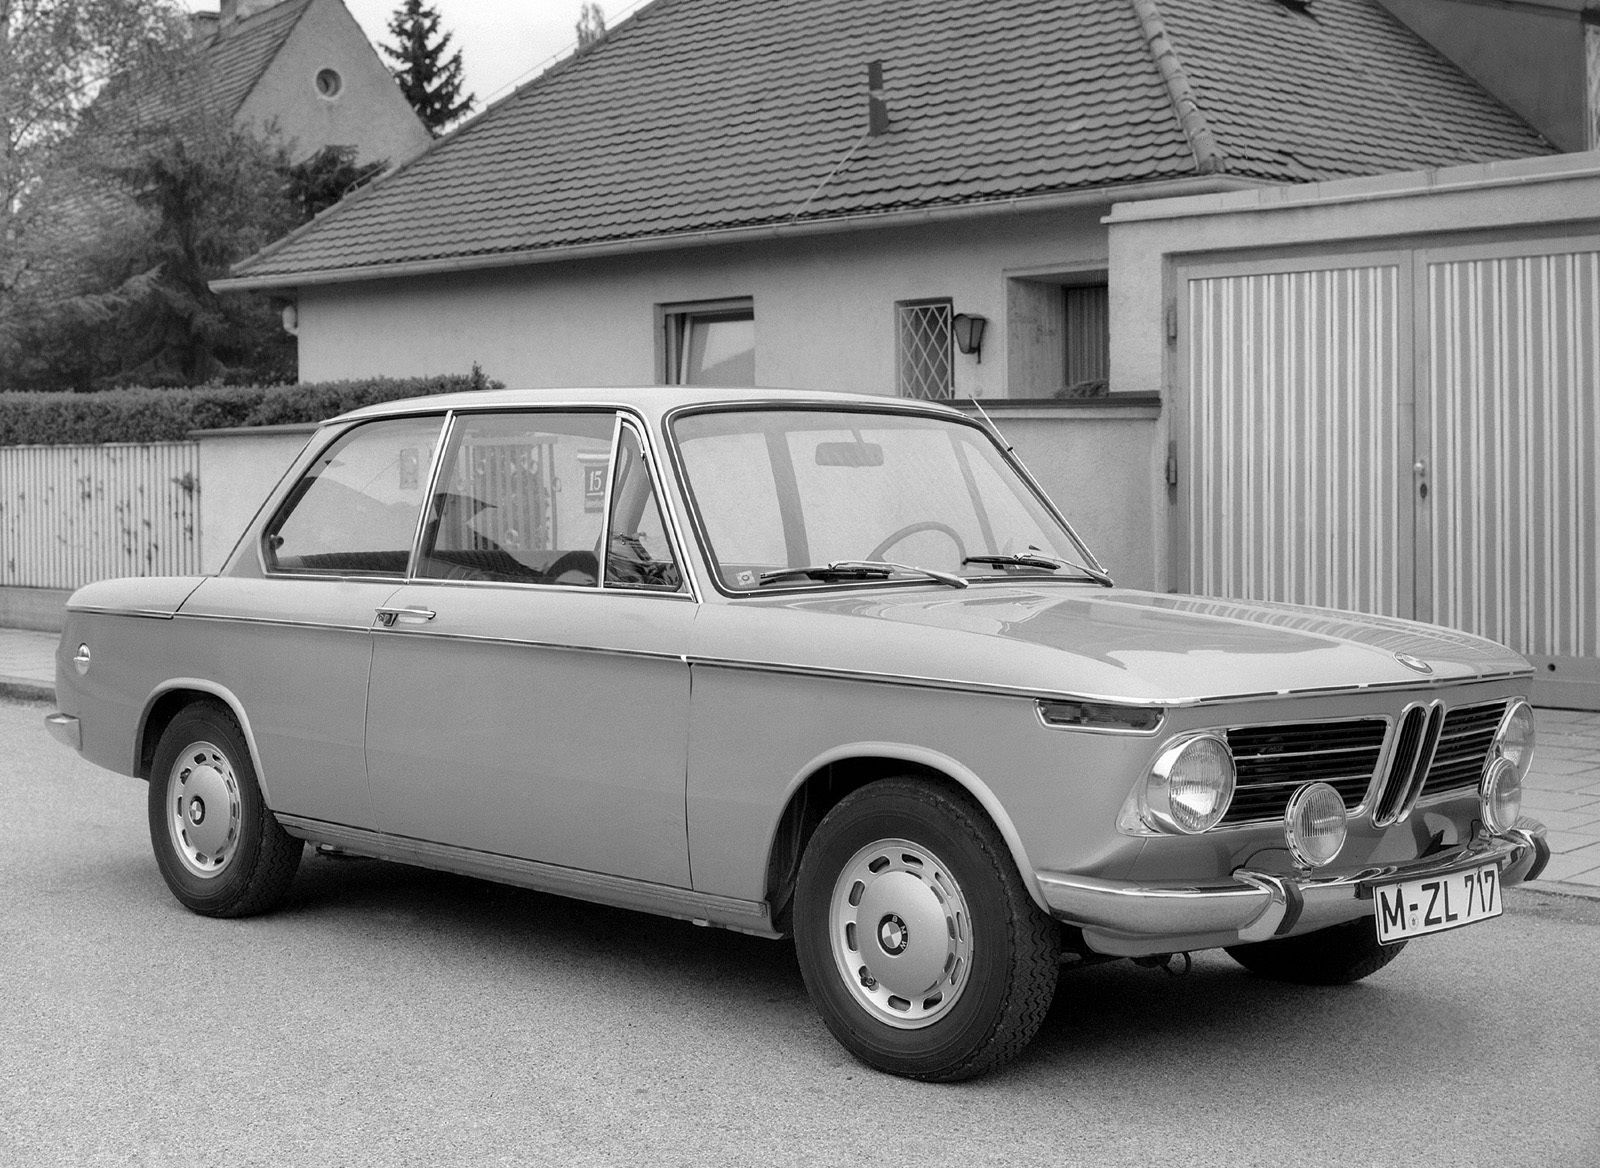 1968 BMW 2002 | Pinterest | Bmw 2002, BMW and Cars